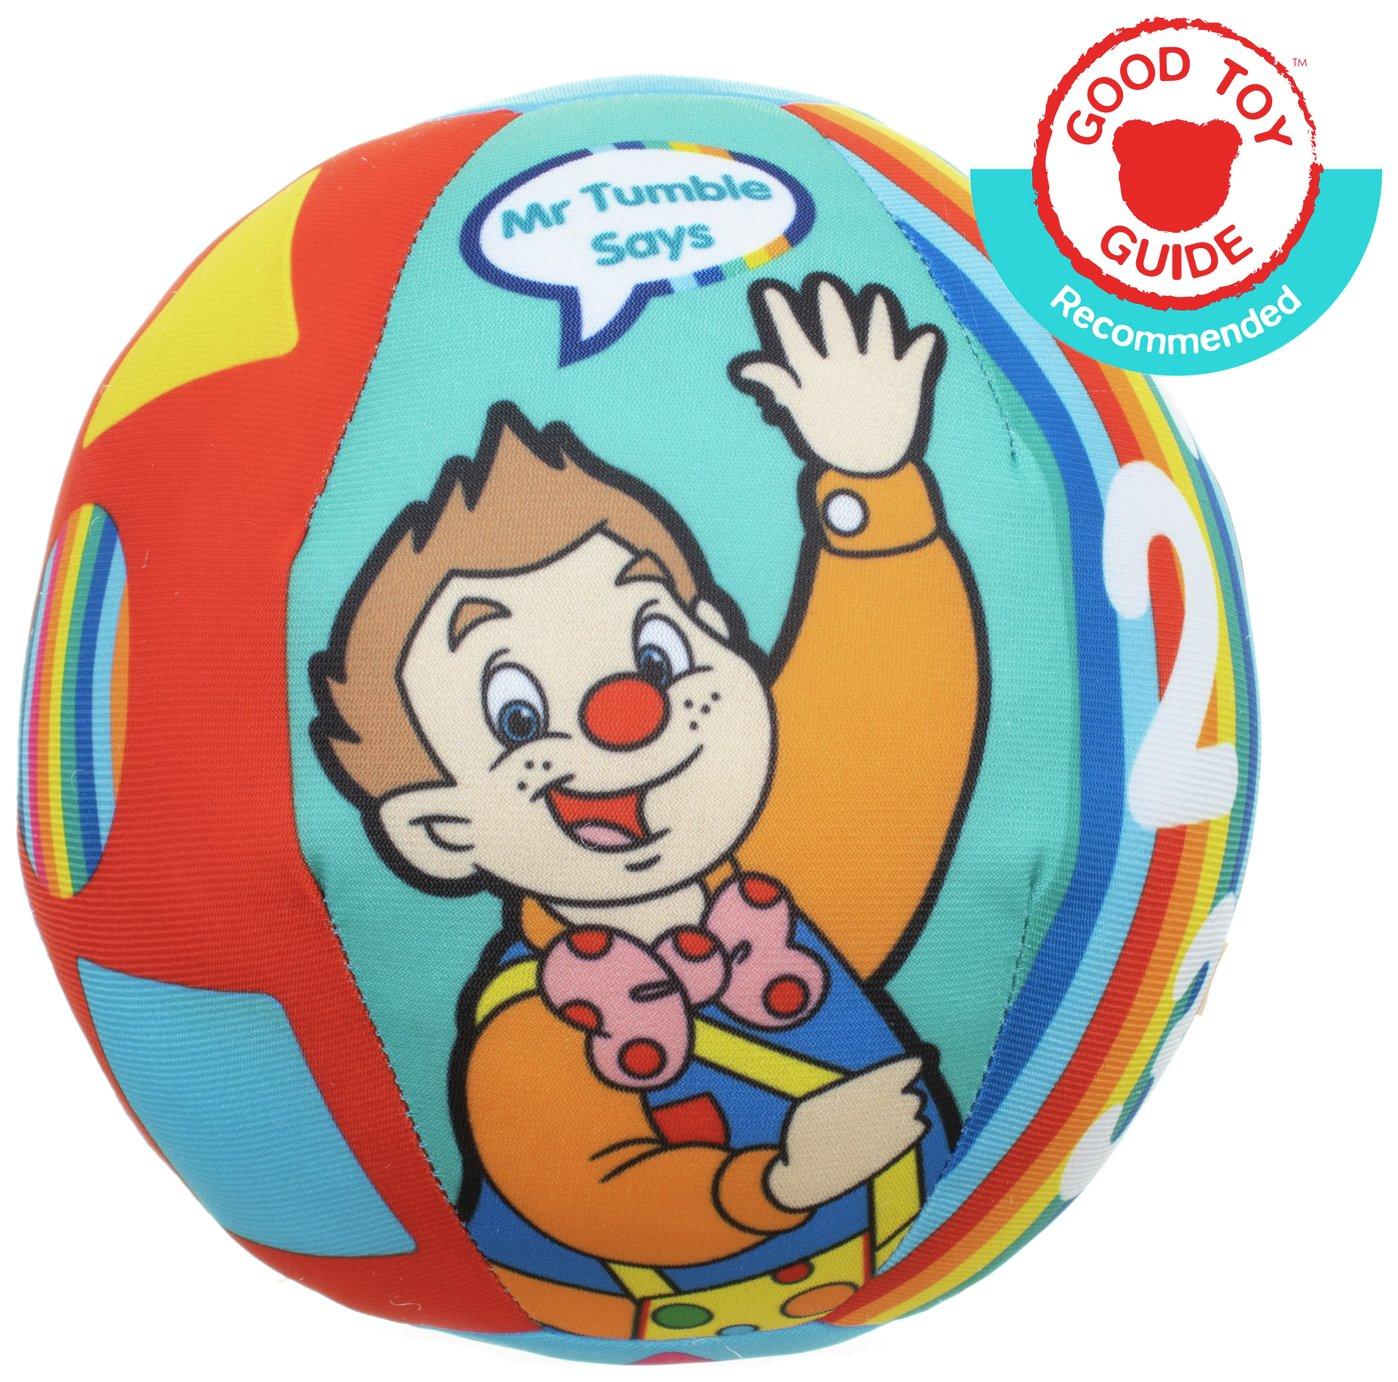 Spotty Ball Mr Tumble Fun Sounds Soft